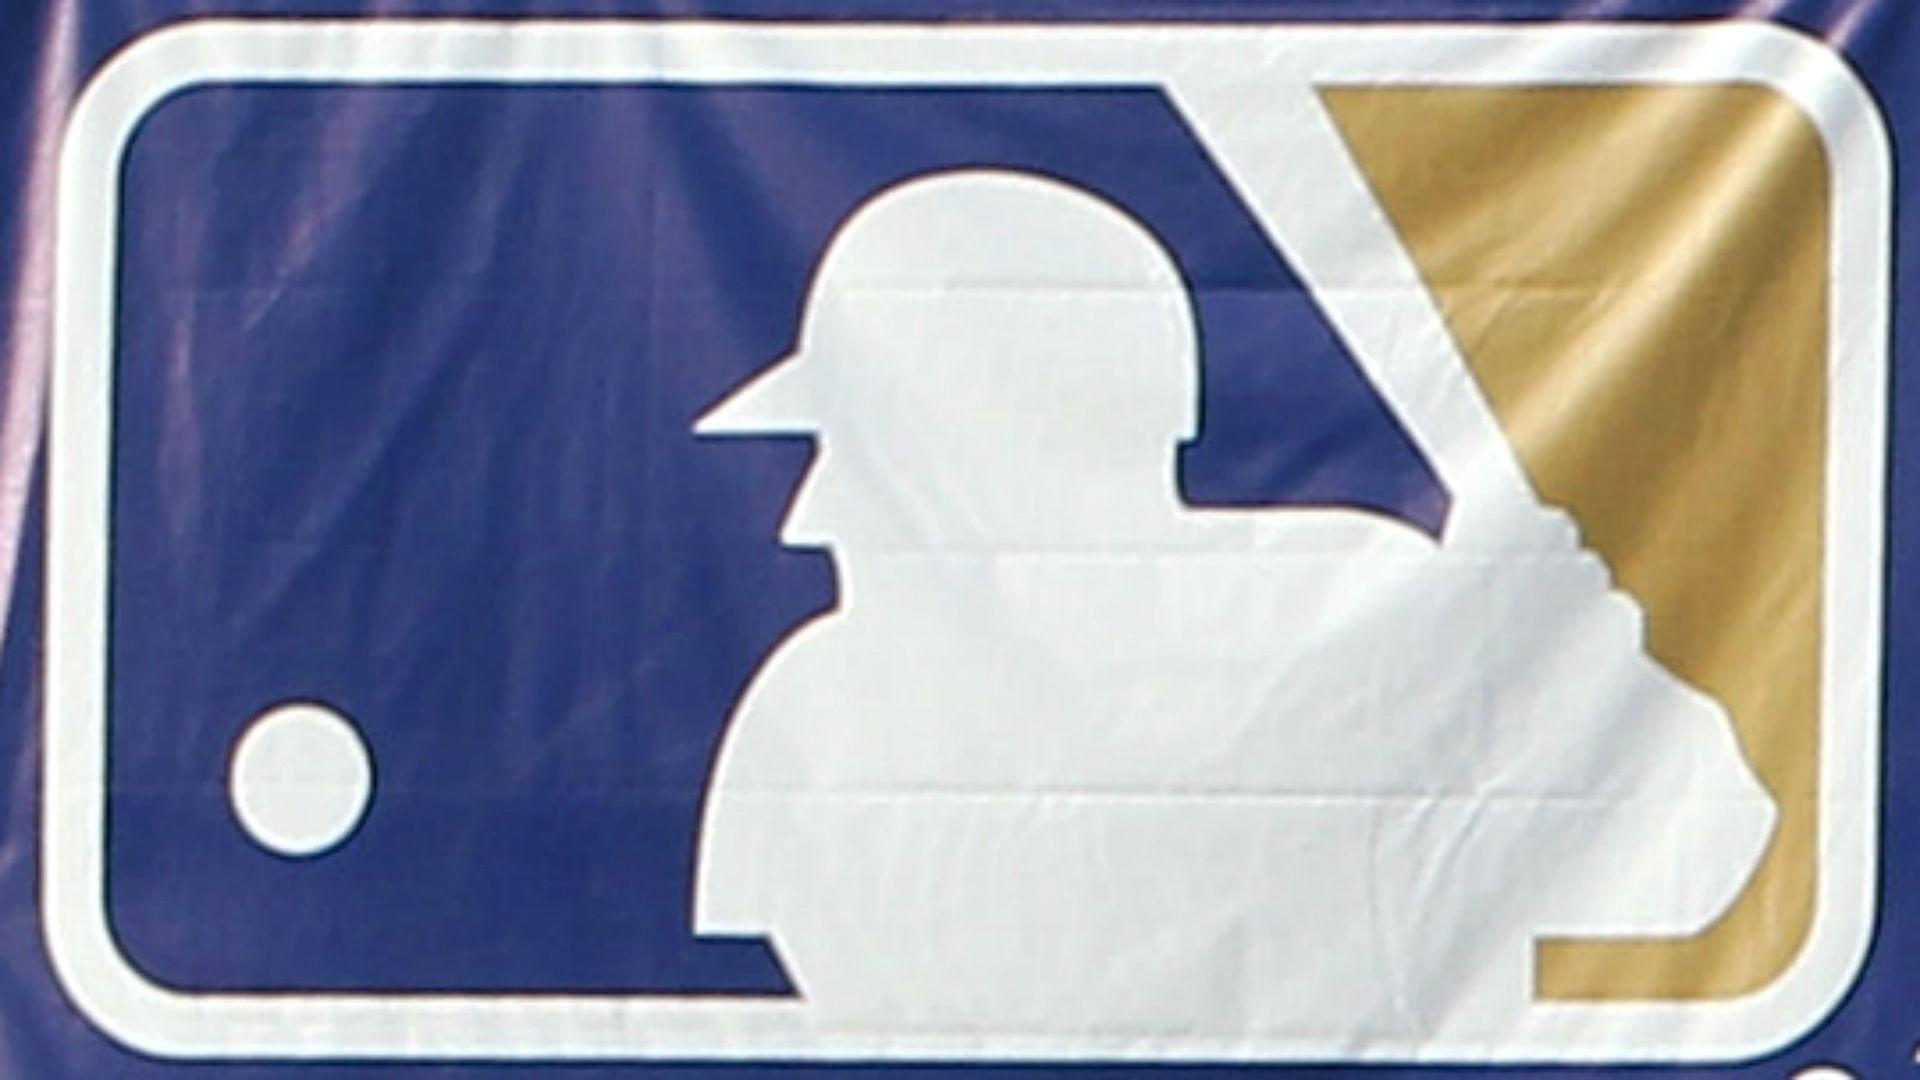 Designer of Major League Baseball's logo dies at 82